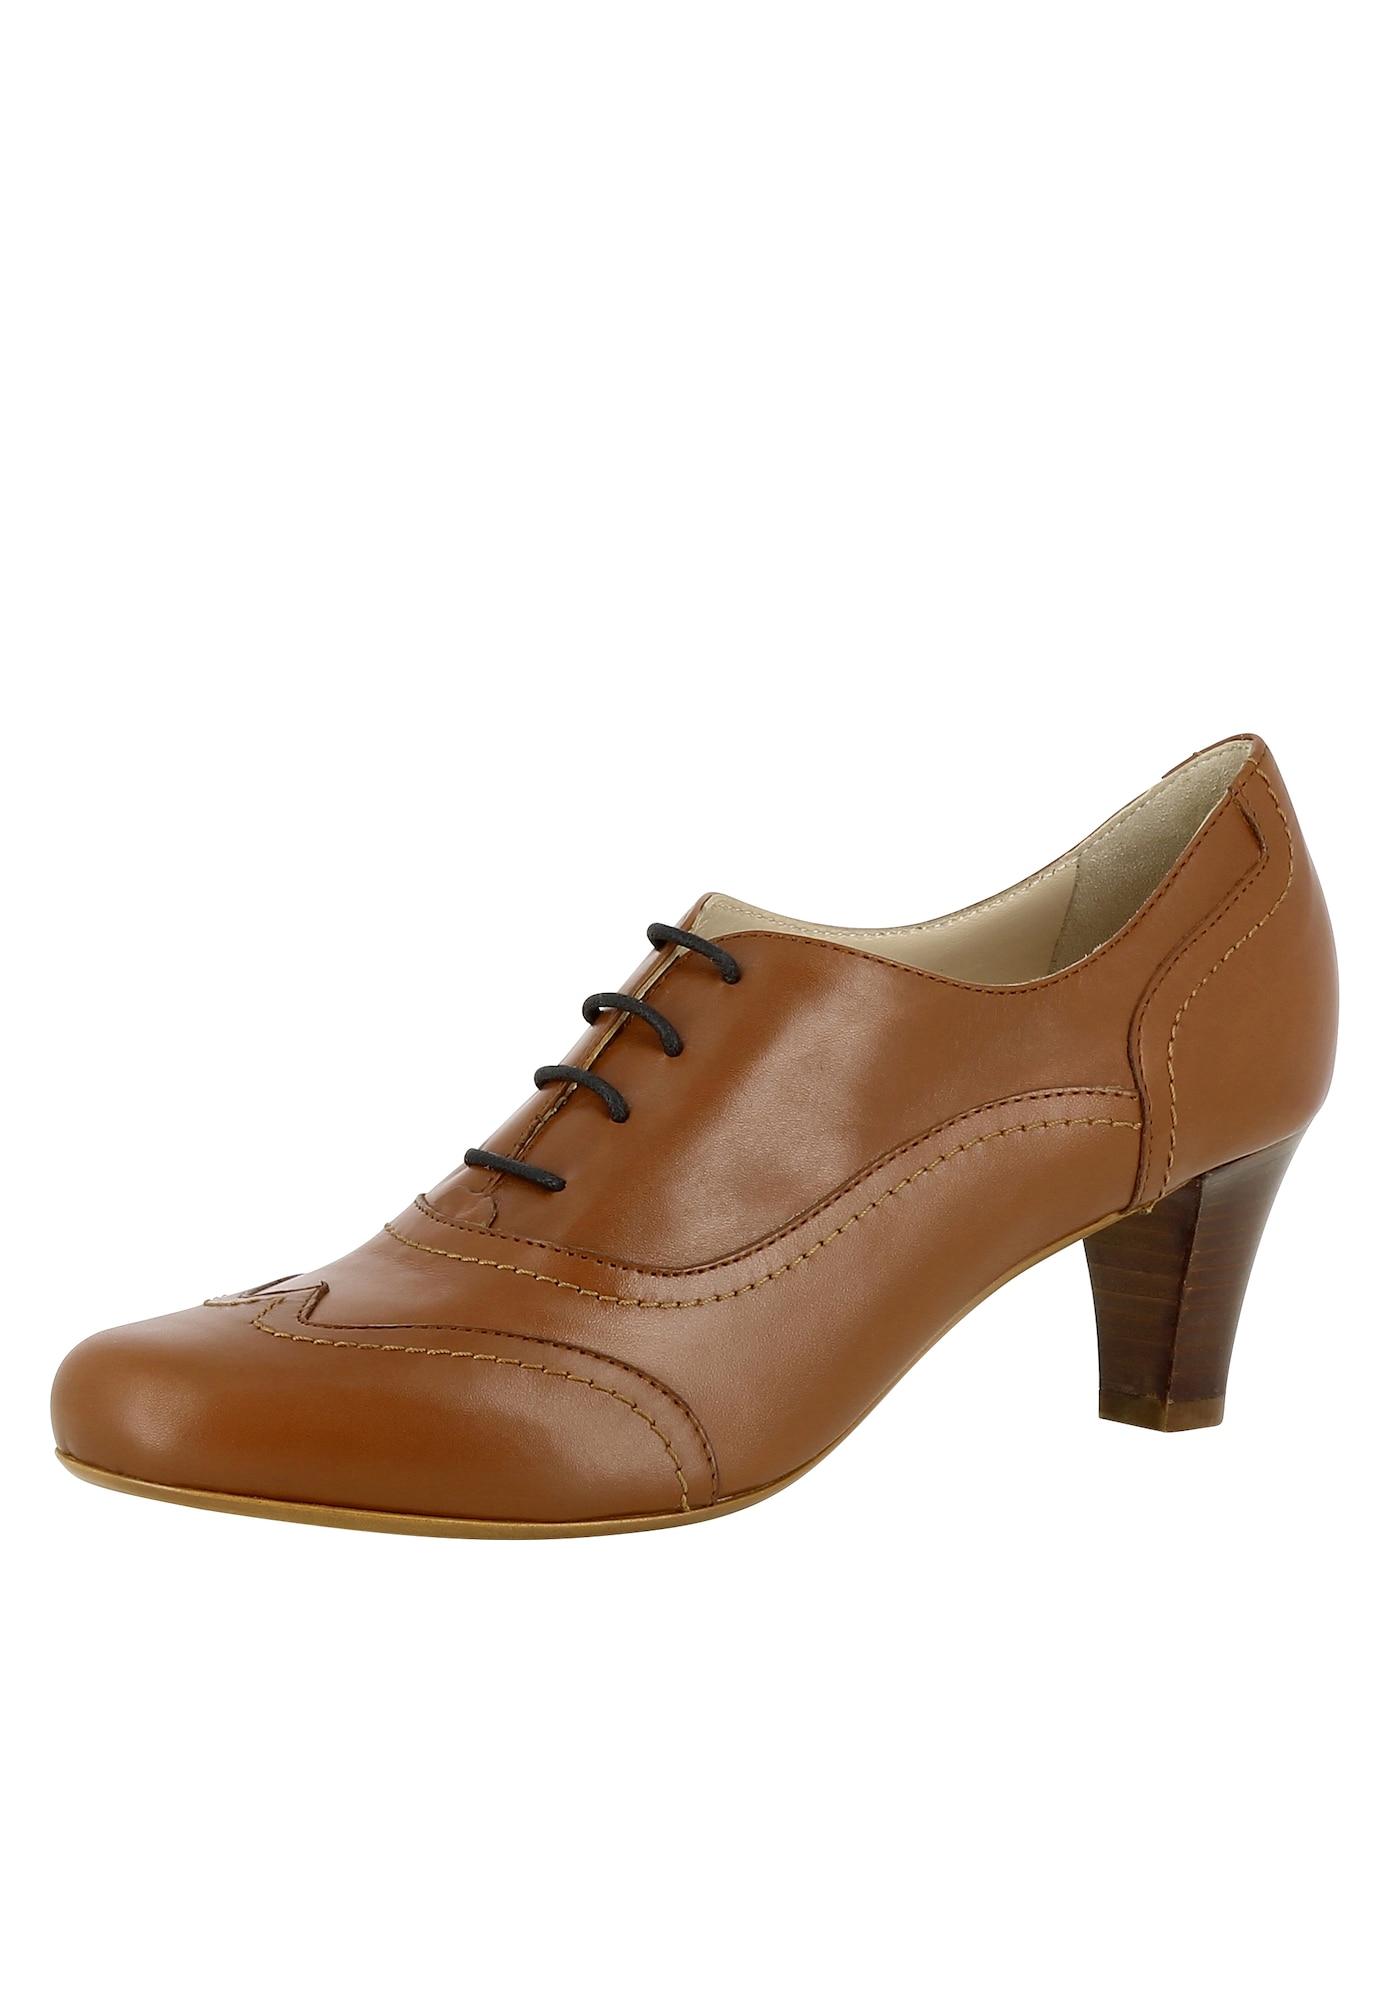 Schnürpumps GIUSY   Schuhe > Pumps > Schnürpumps   EVITA